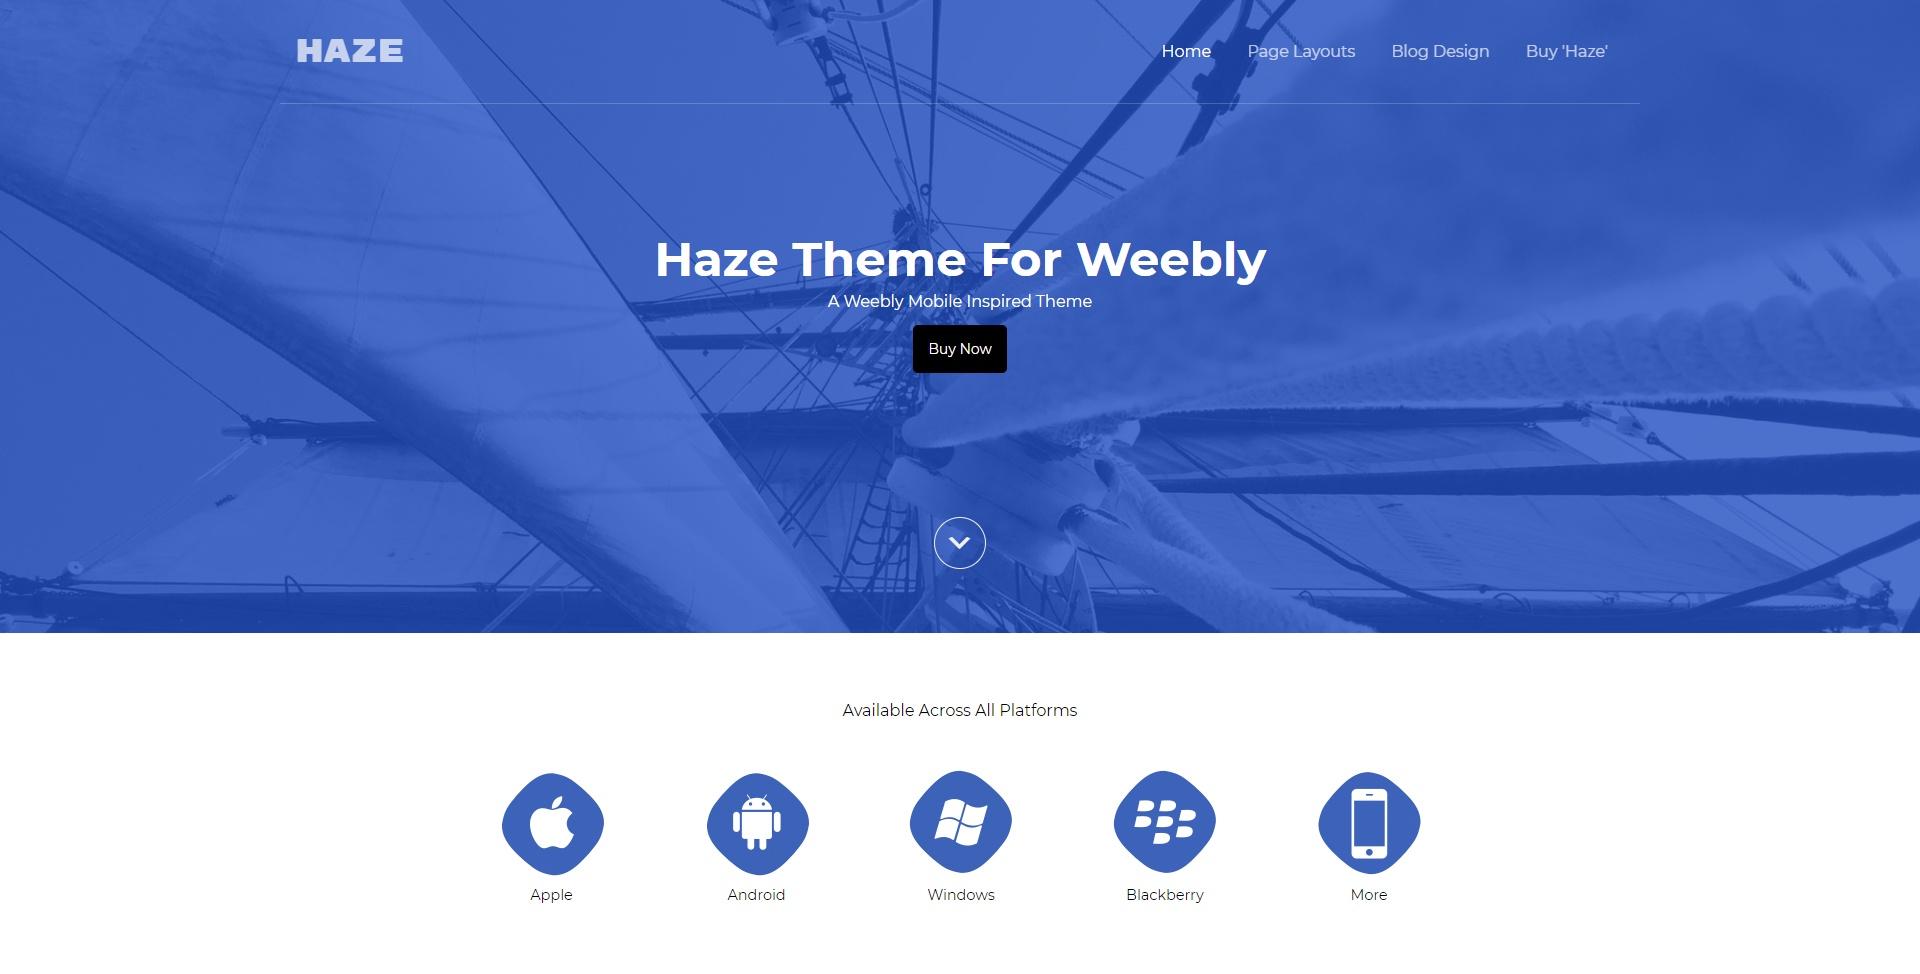 Haze (Weebly Theme)